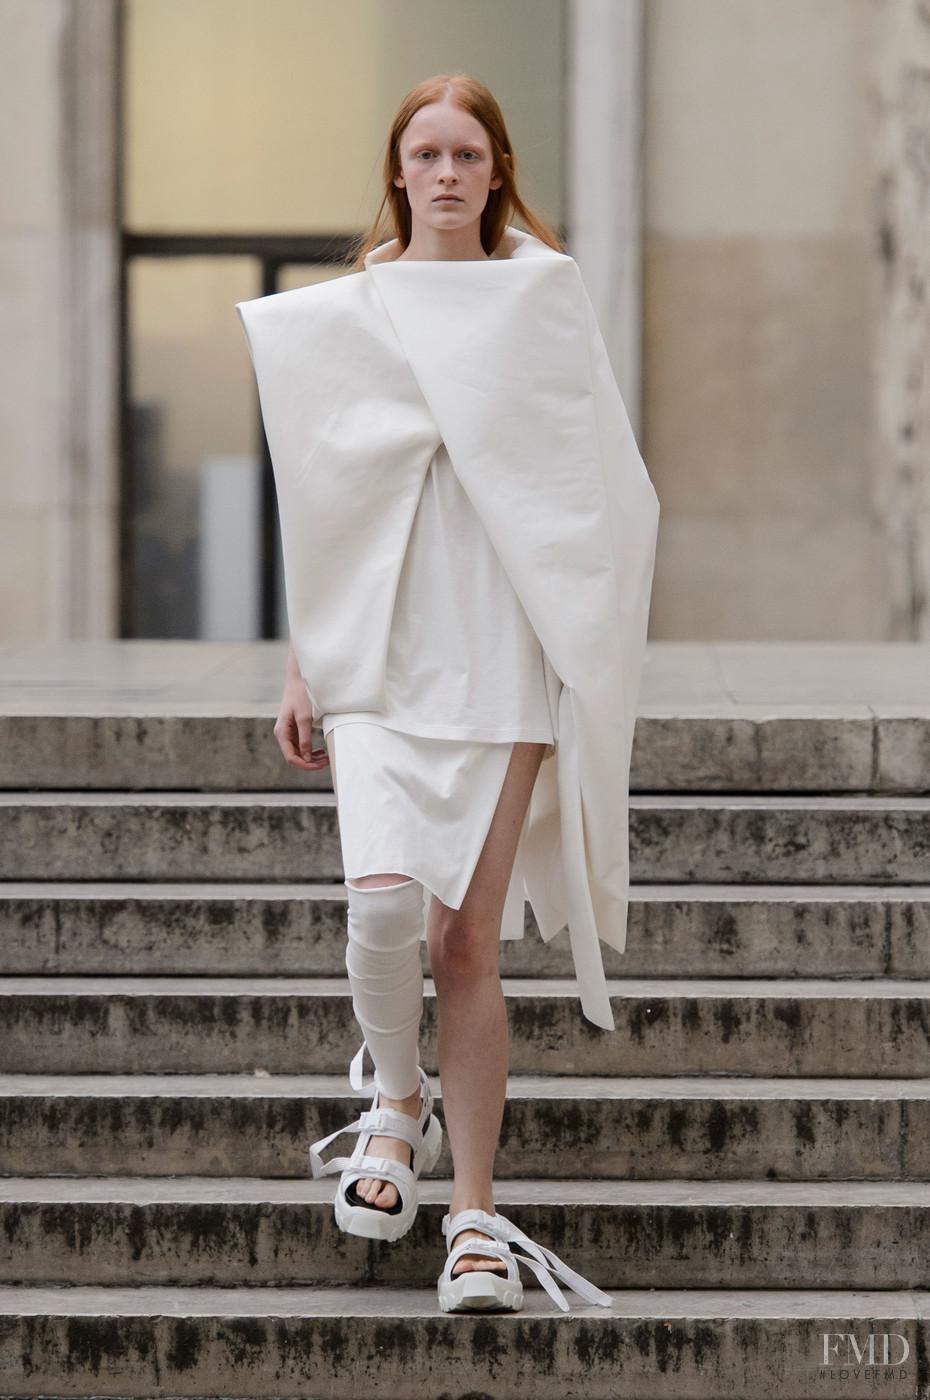 Rick owens fashion show 2018 59